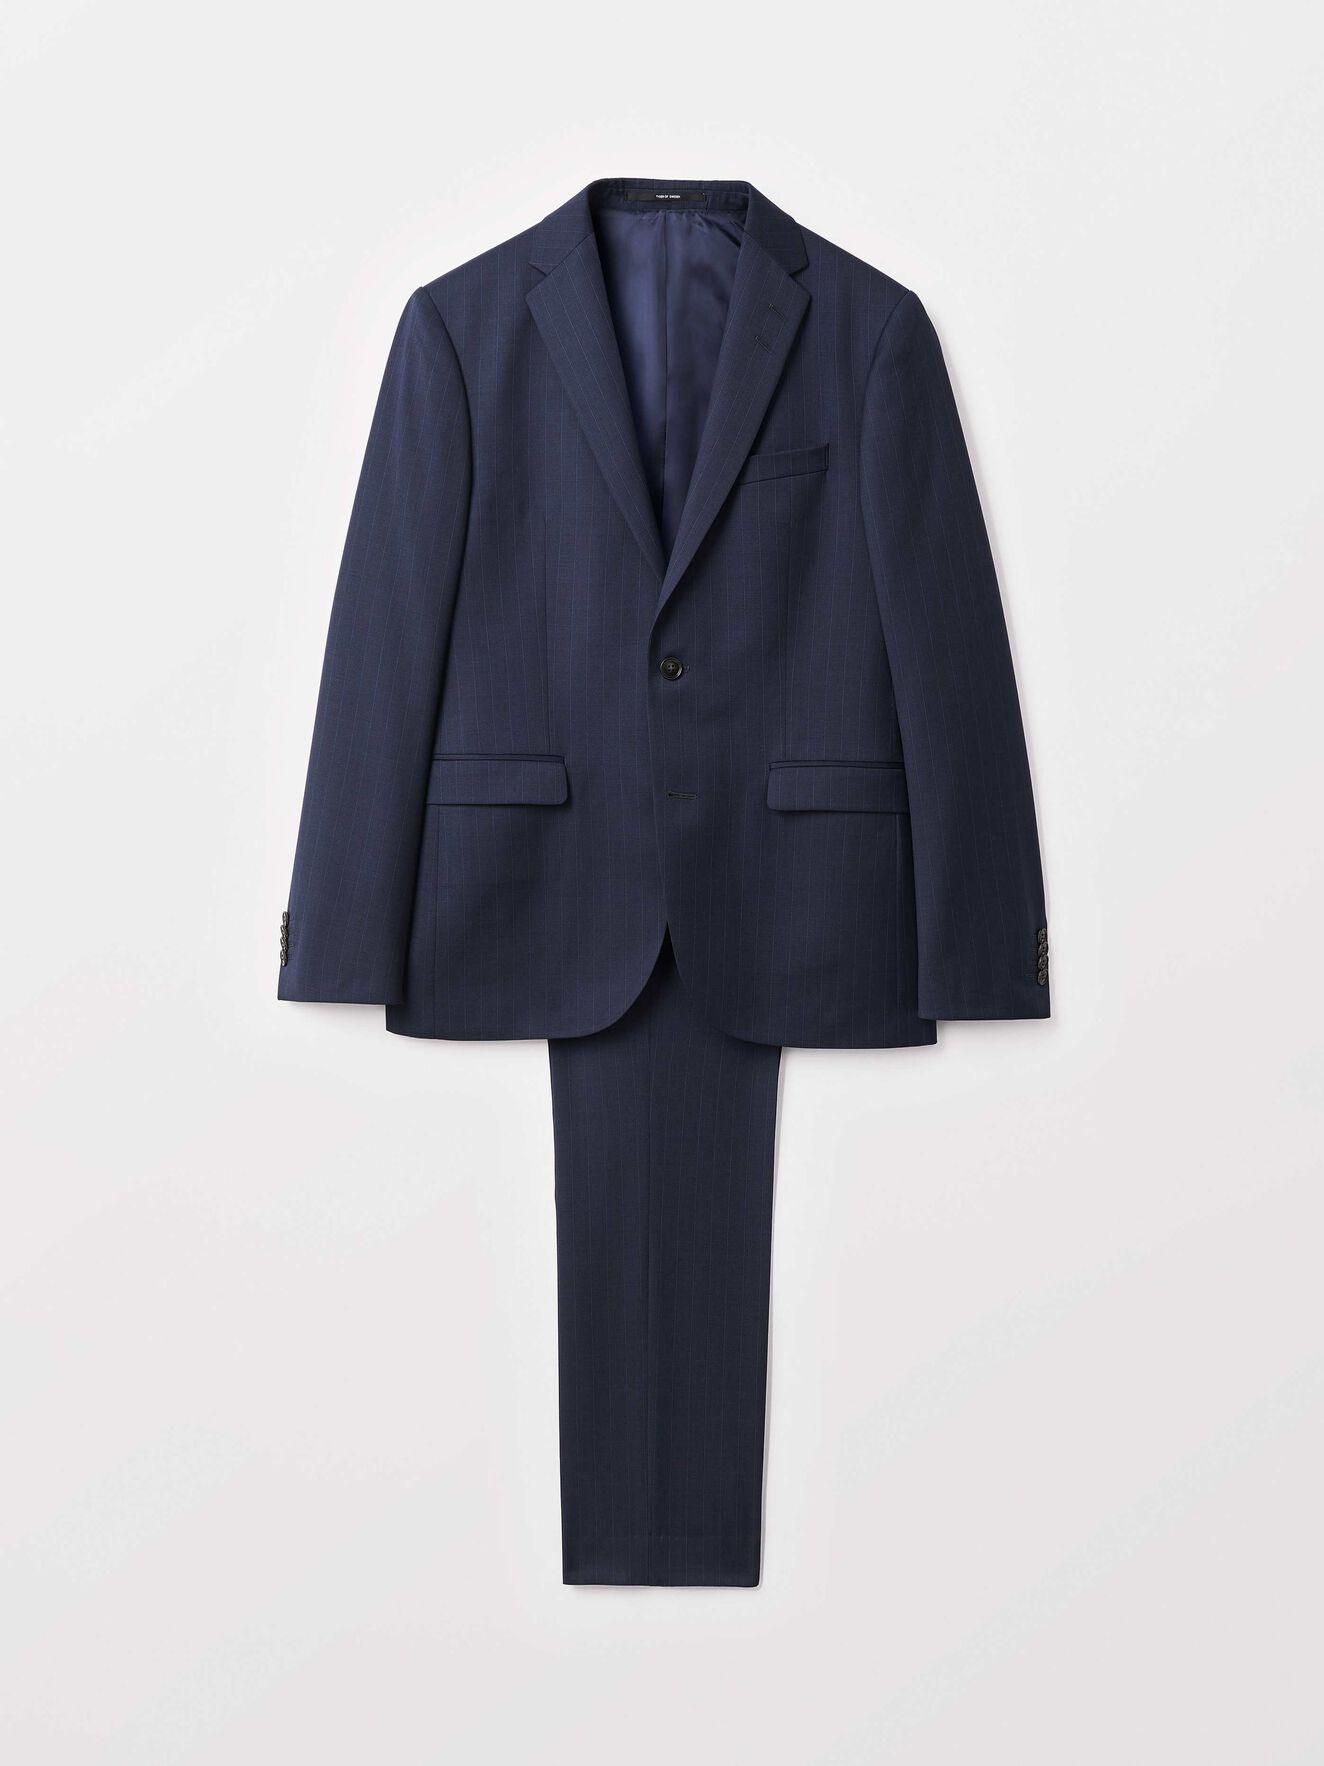 Henrie Suit in Light Ink from Tiger of Sweden